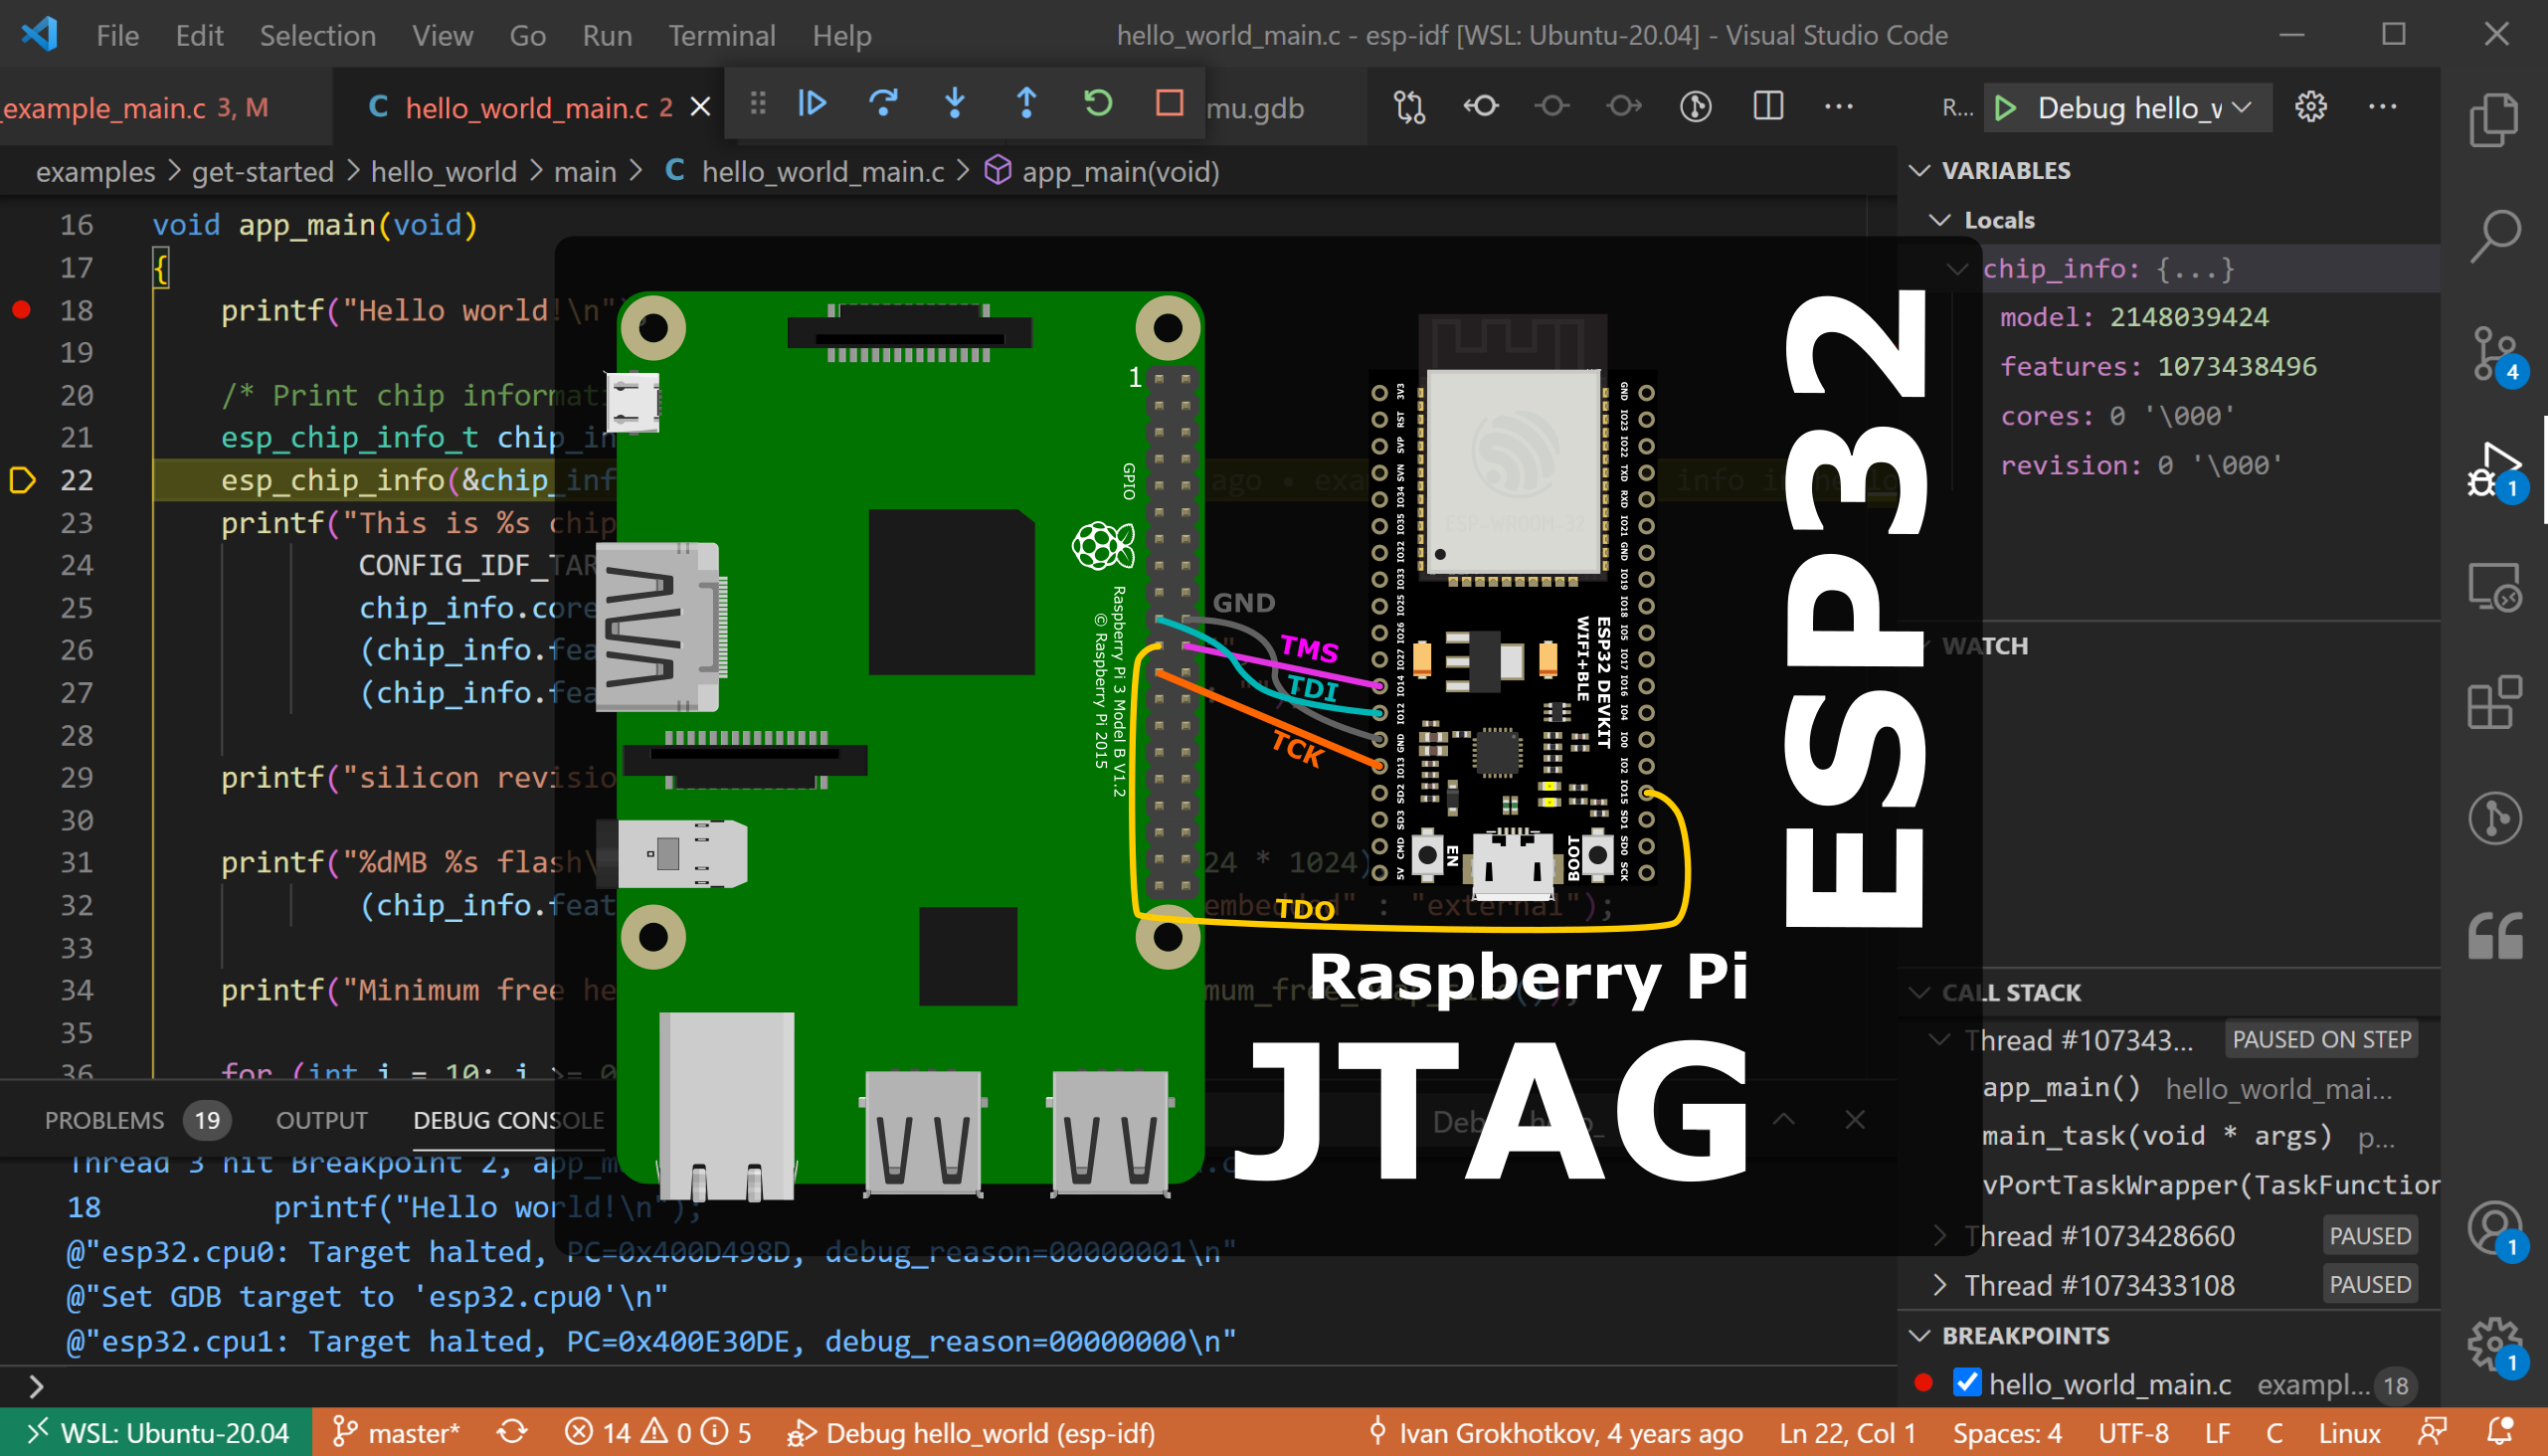 ESP32 JTAG Debugging using Raspberry Pi